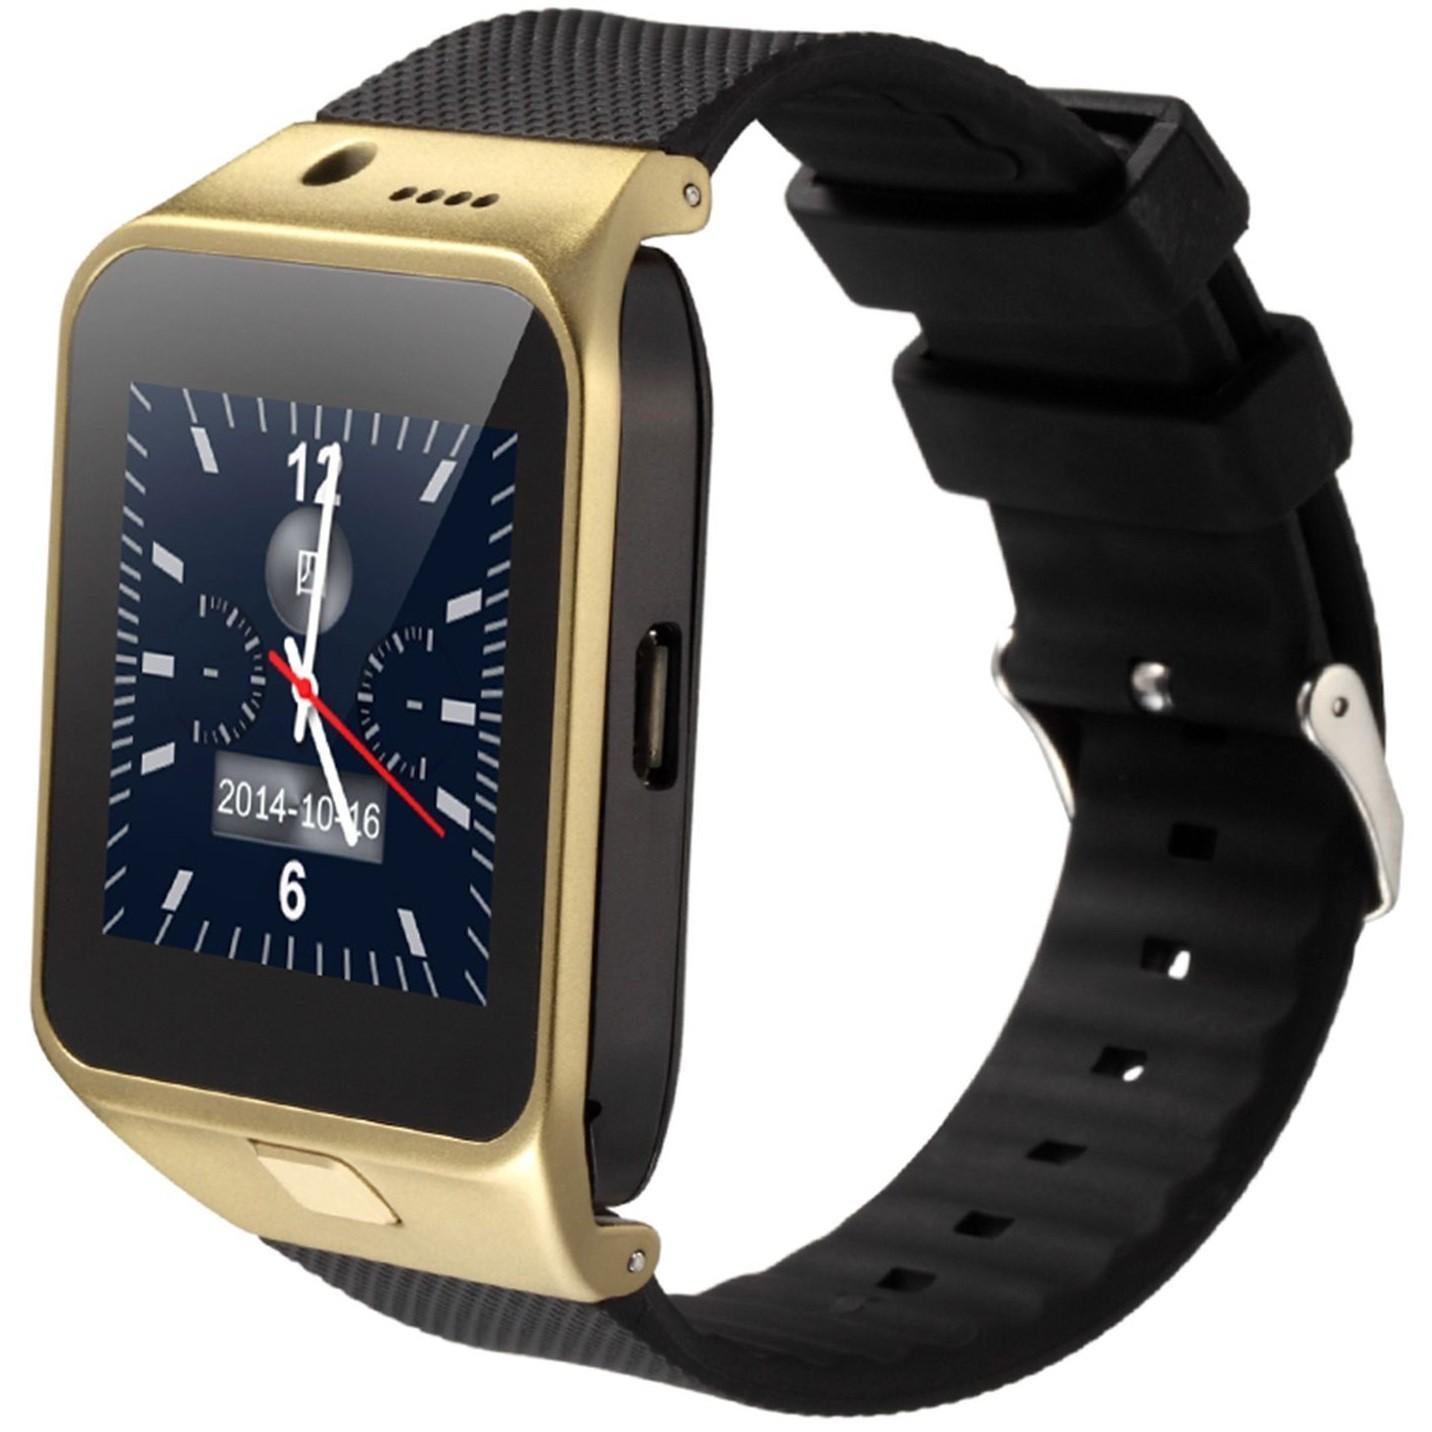 Ceas Smartwatch cu Telefon iUni U17, Camera 1.3M, BT, Slot card, Auriu imagine techstar.ro 2021